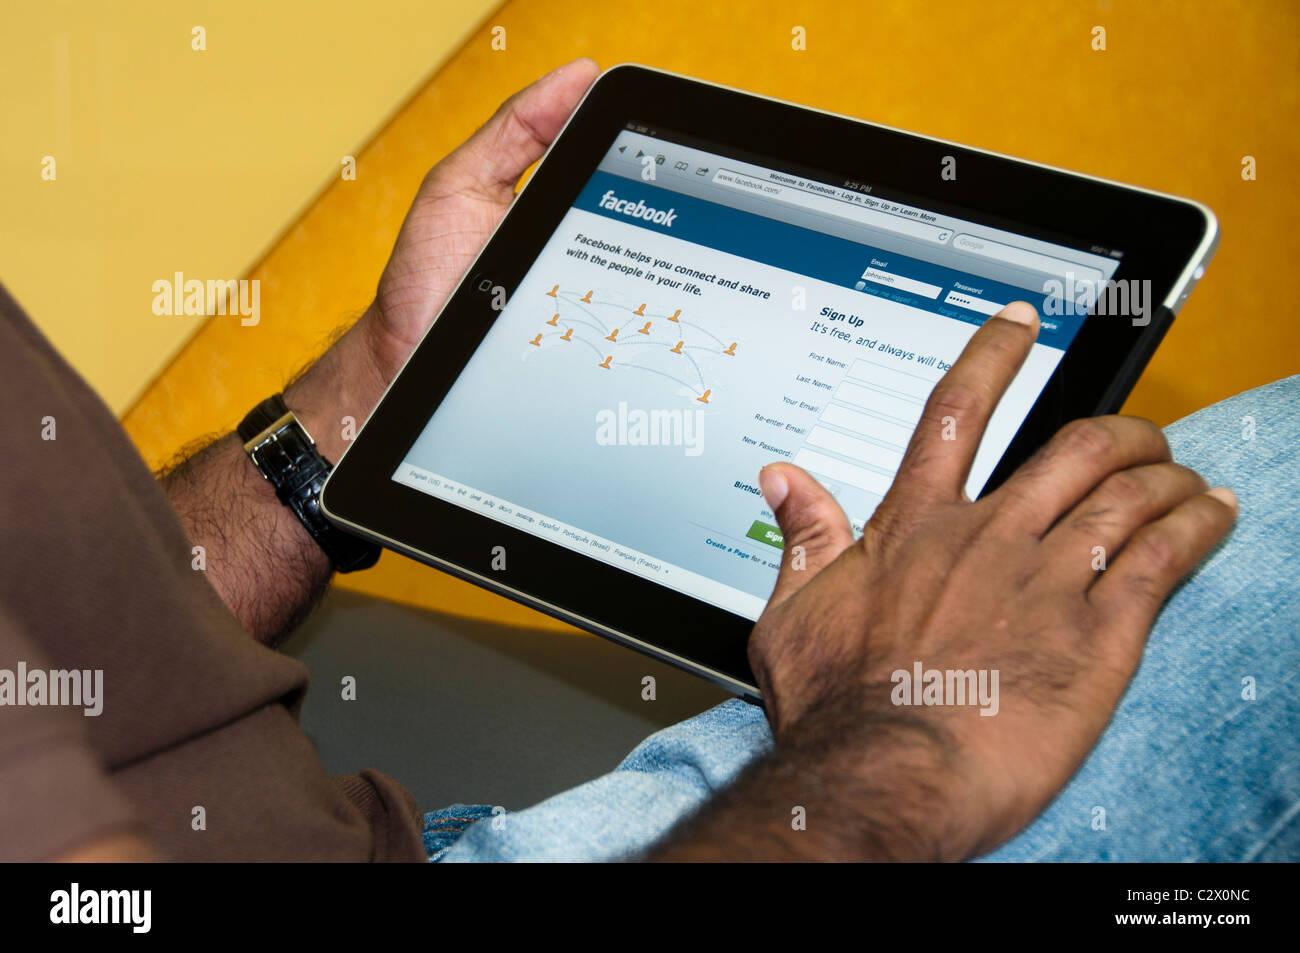 Vista de cerca de un hombre usando Facebook con iPad Imagen De Stock